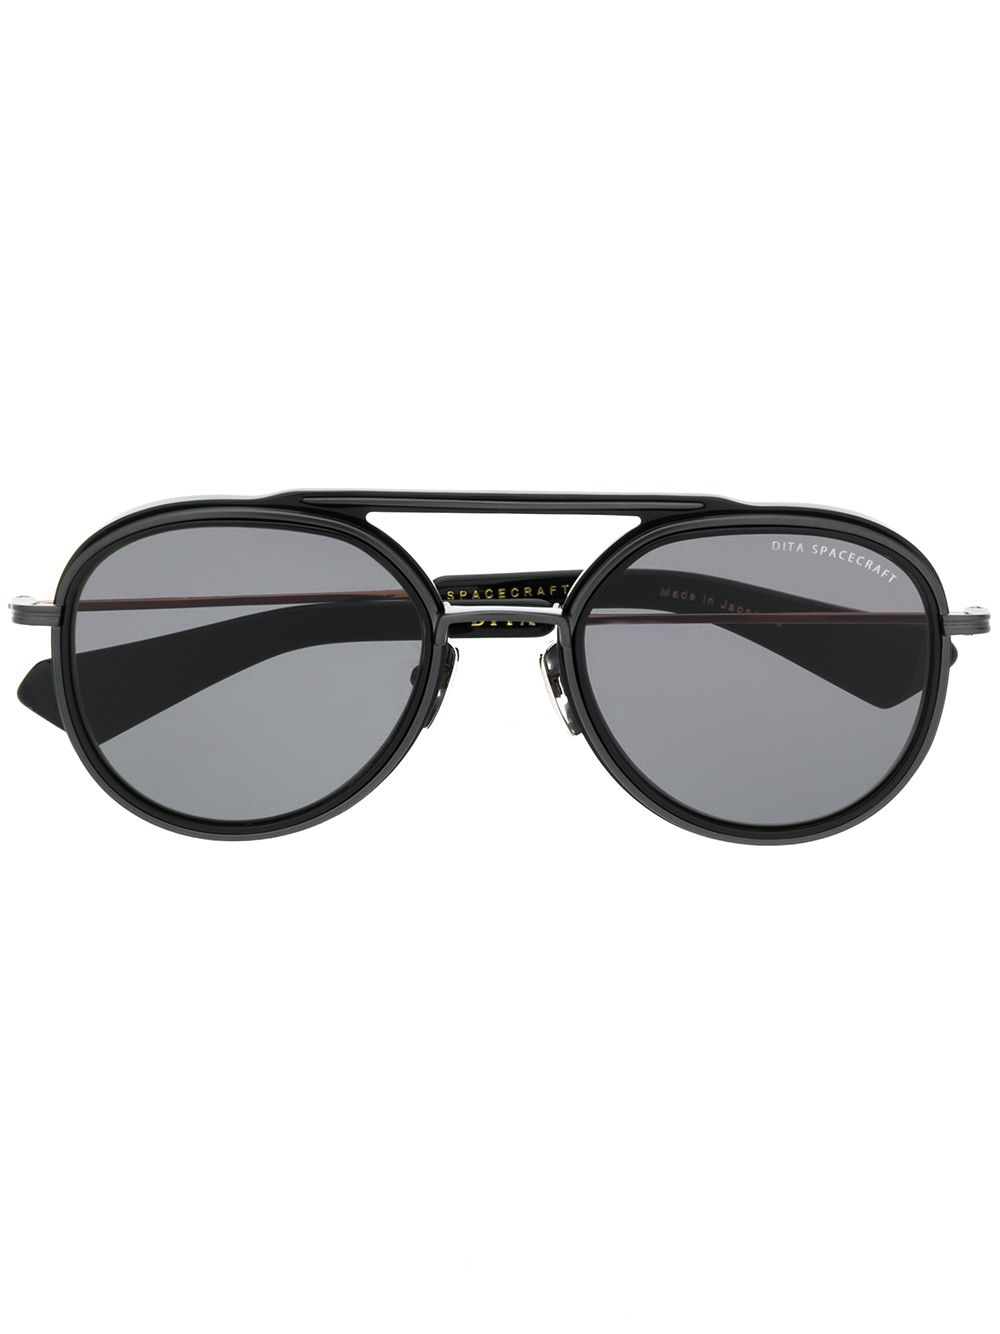 Dita Eyewear Side-frames Aviator Sunglasses In Black